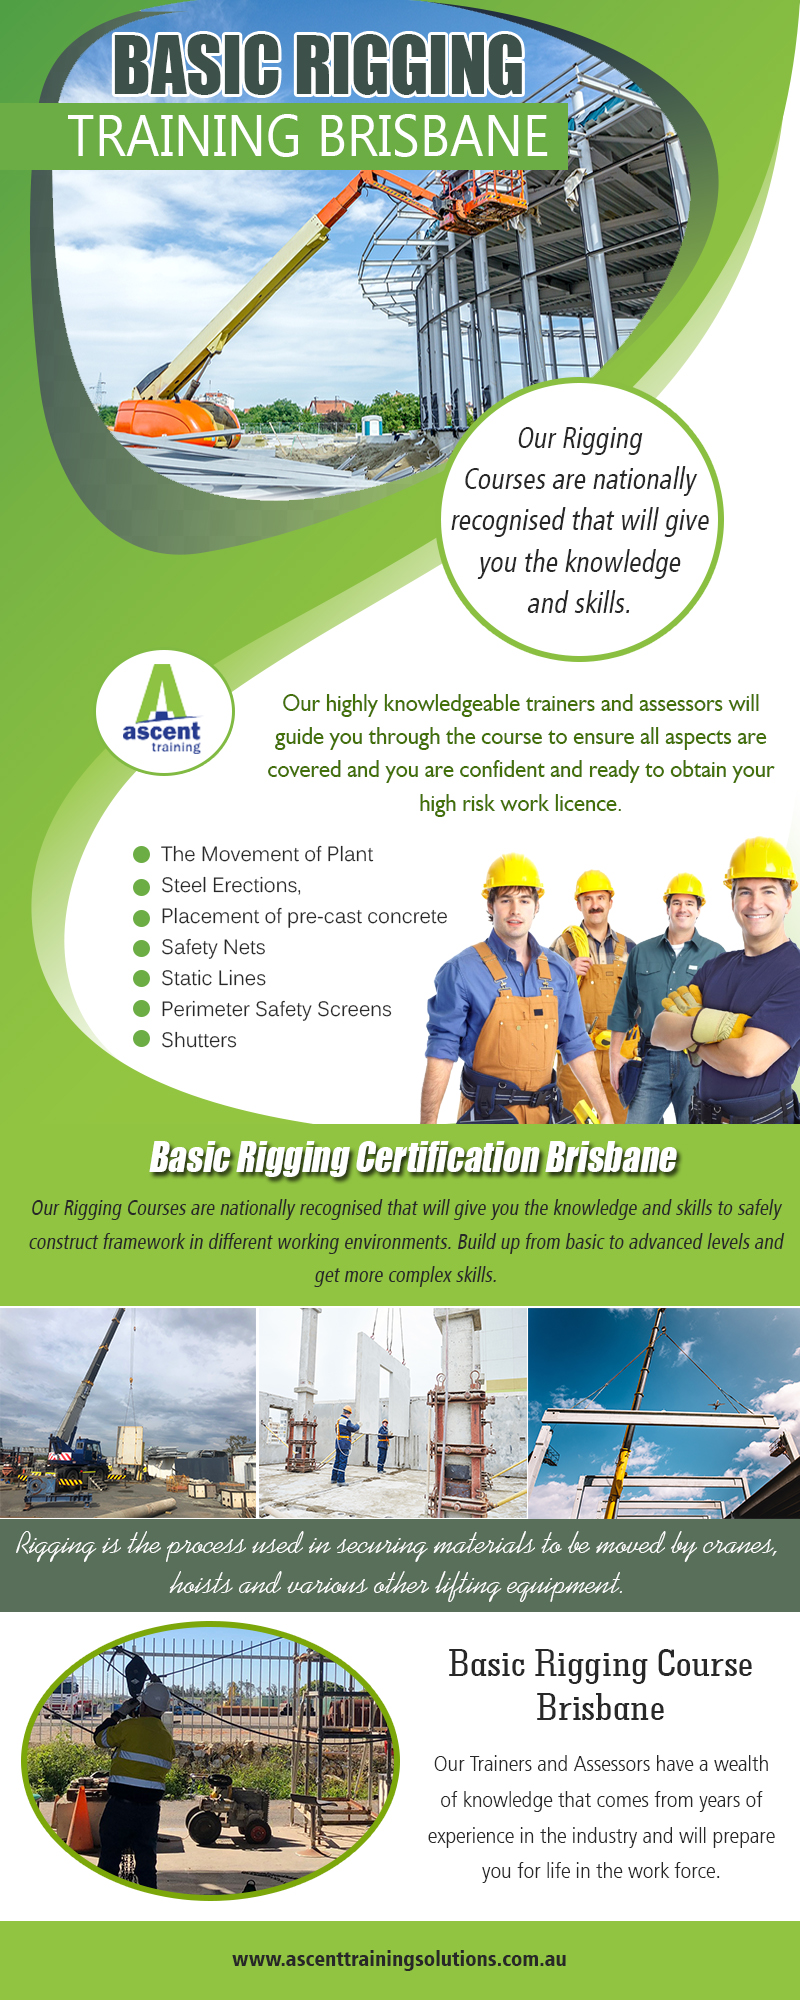 Basic Rigging Training Brisbane